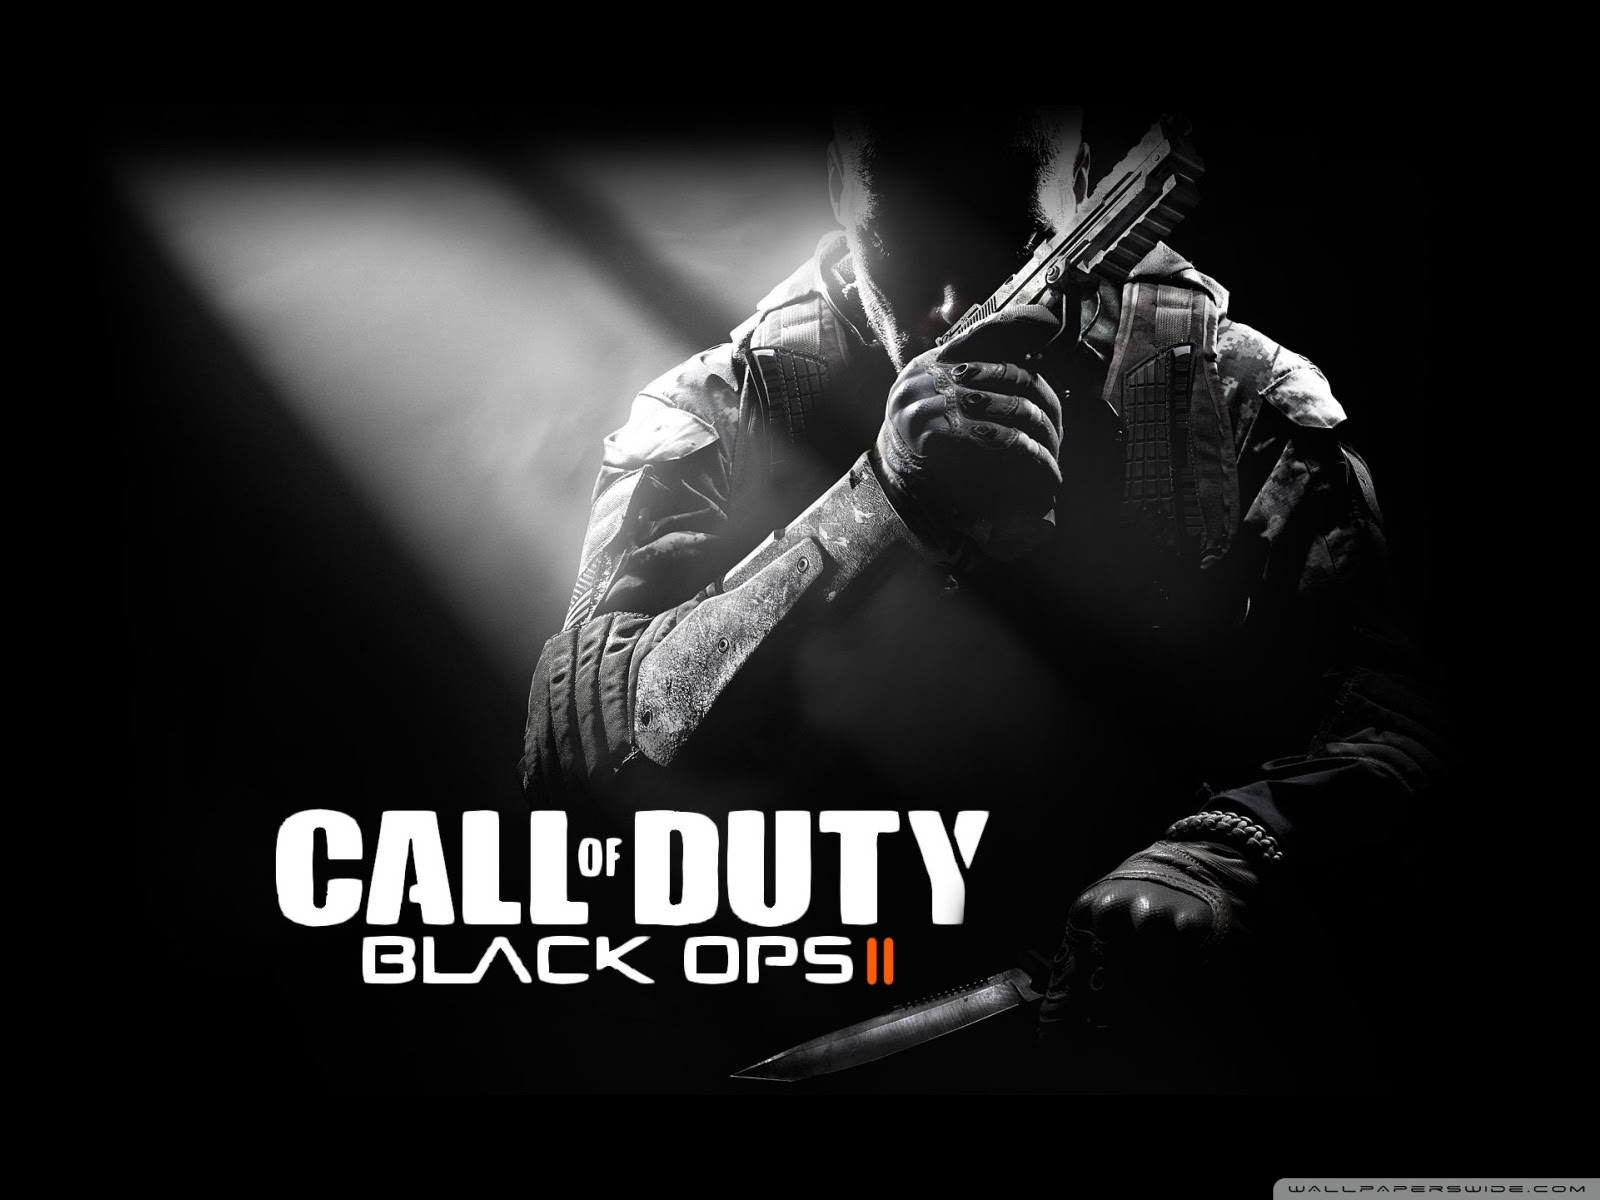 Call Of Duty Black Ops 2 Ultra Hd Desktop Background Wallpaper For